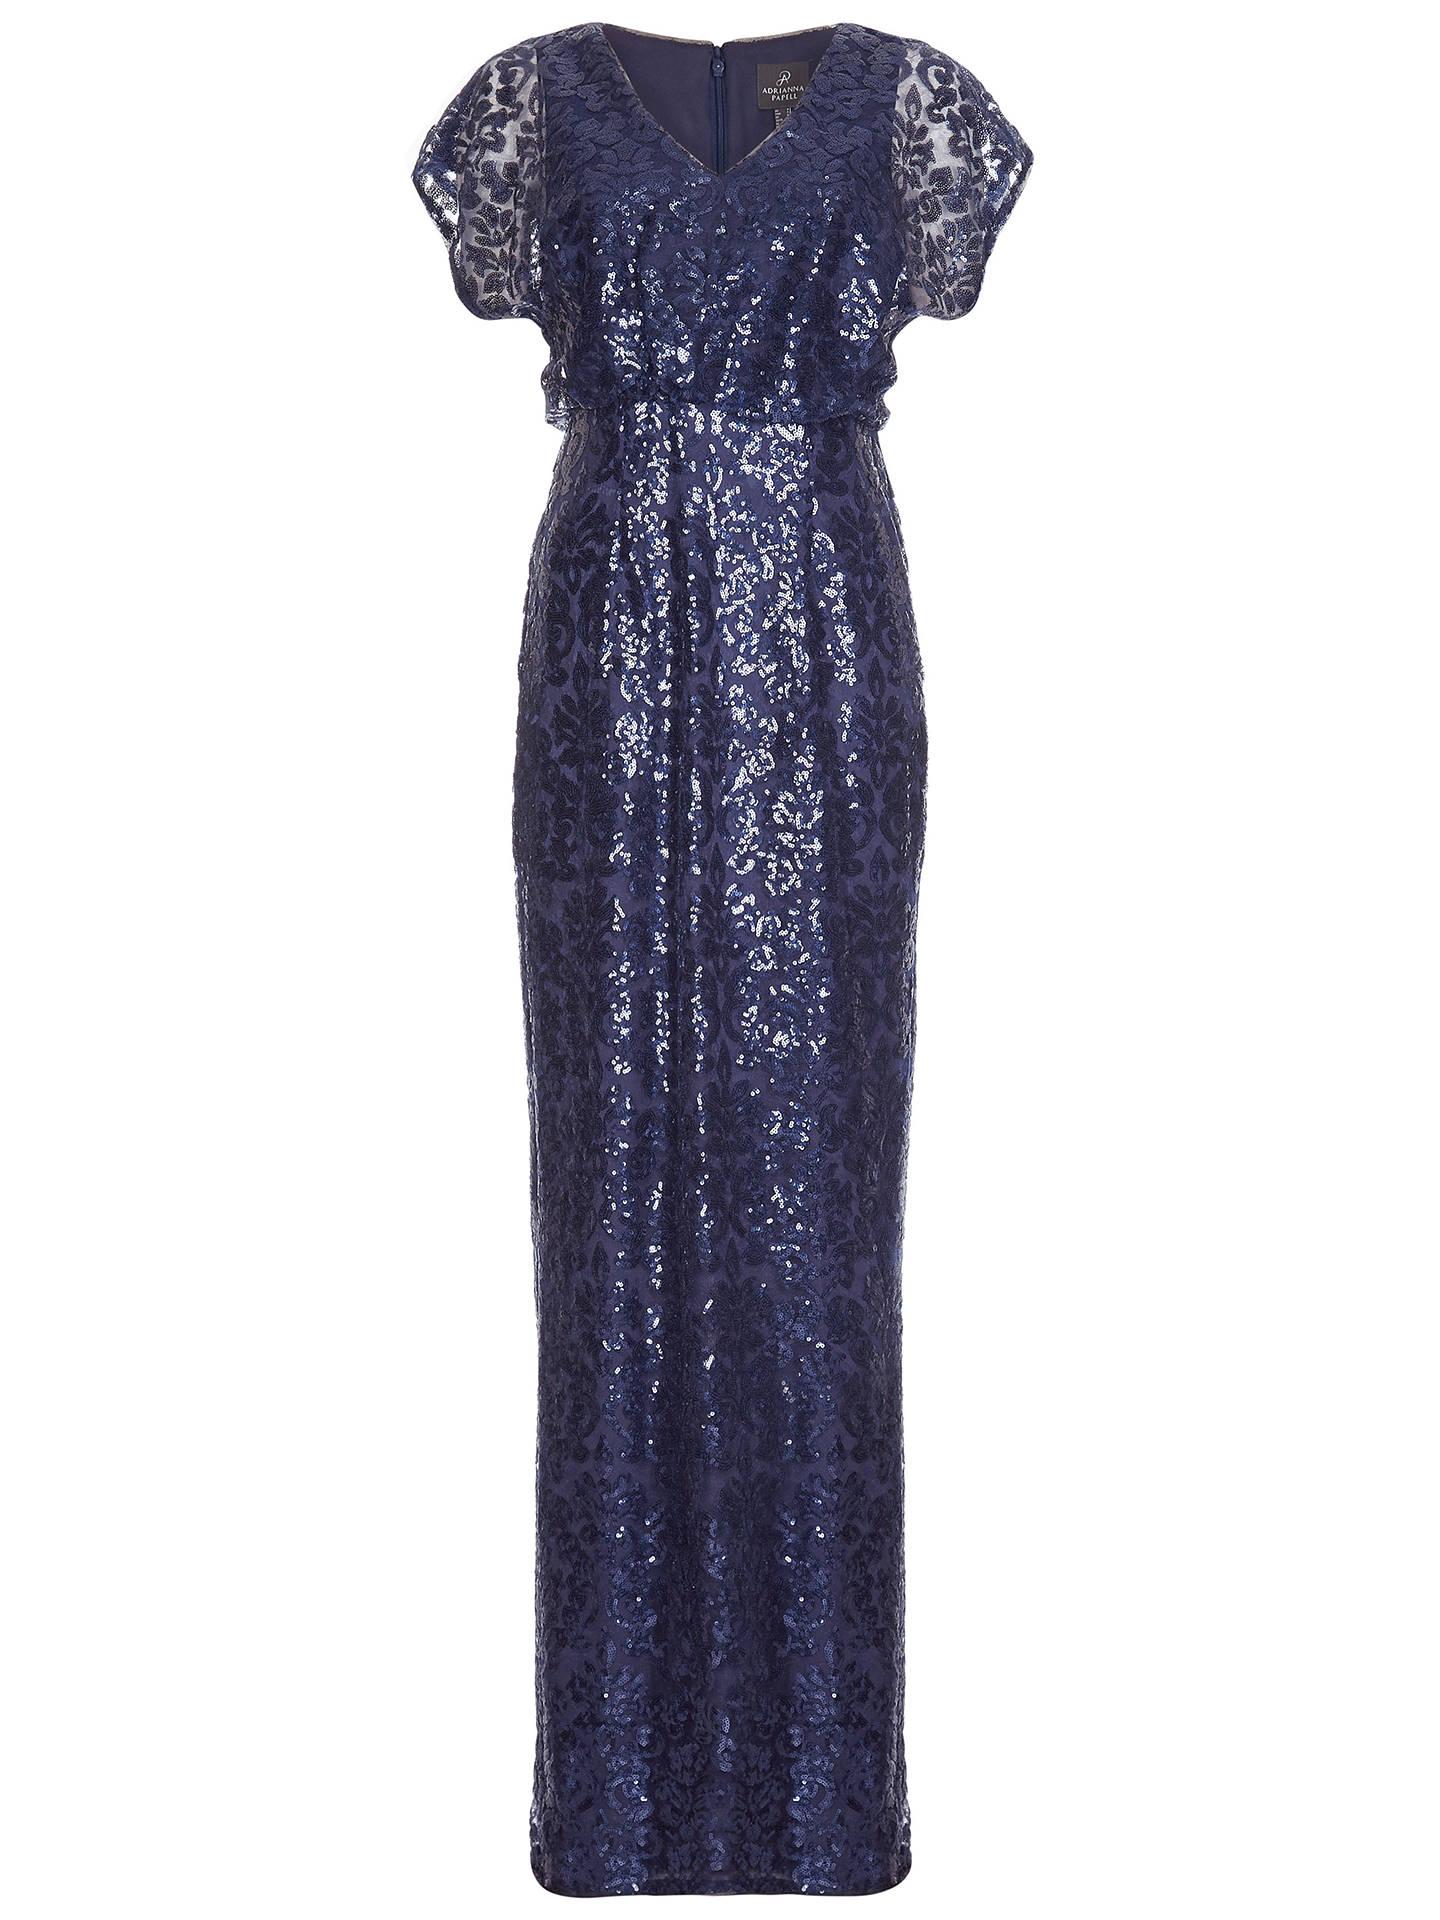 Adrianna Papell Women/'s Sequin Blouson Dress